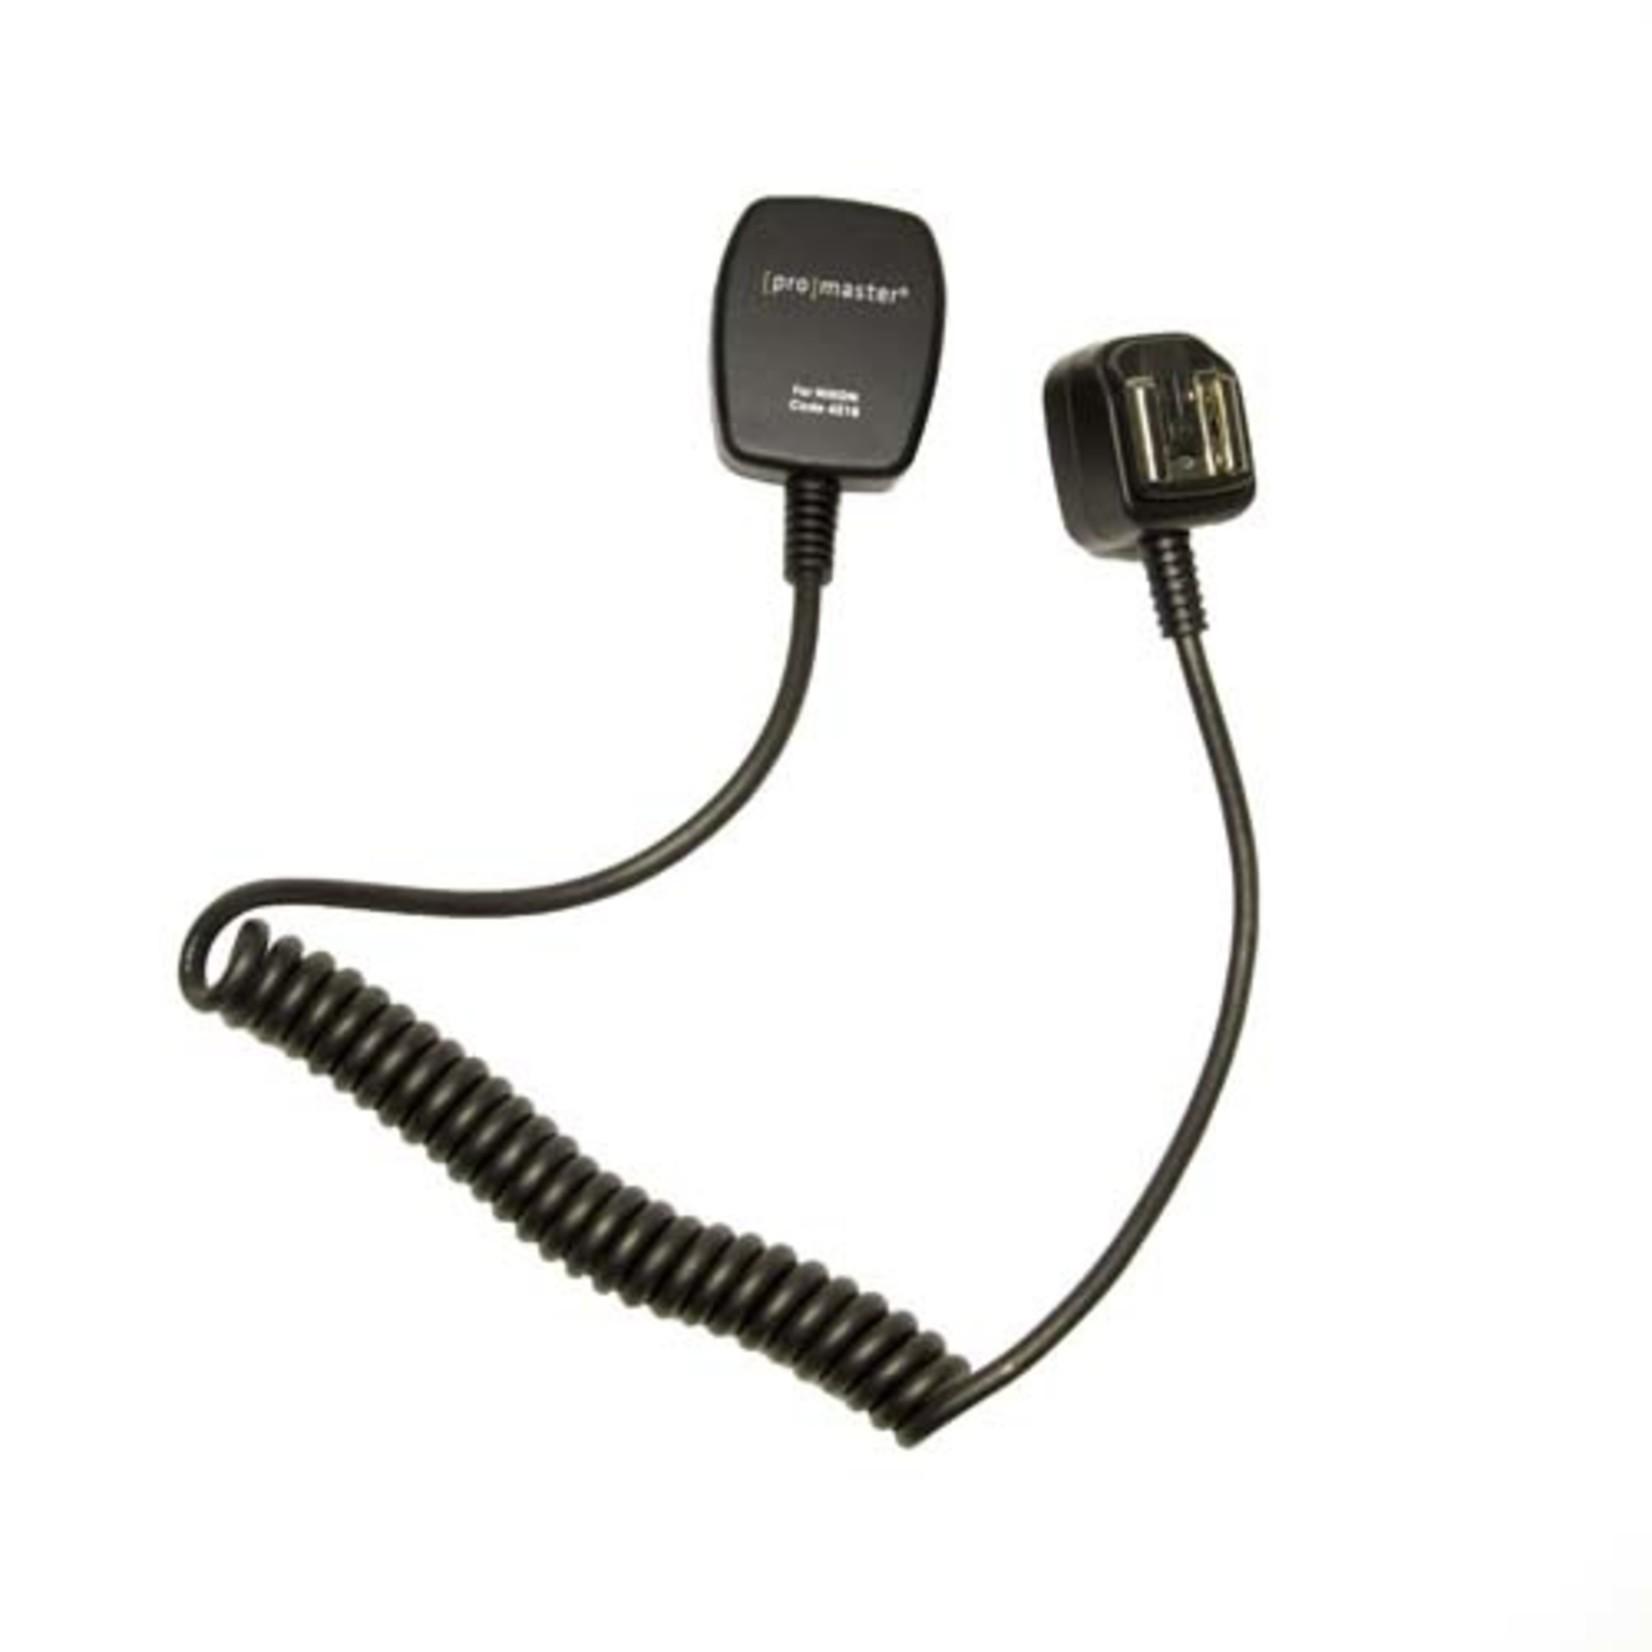 ProMaster TTL Off Camera Flash Cord - Nikon